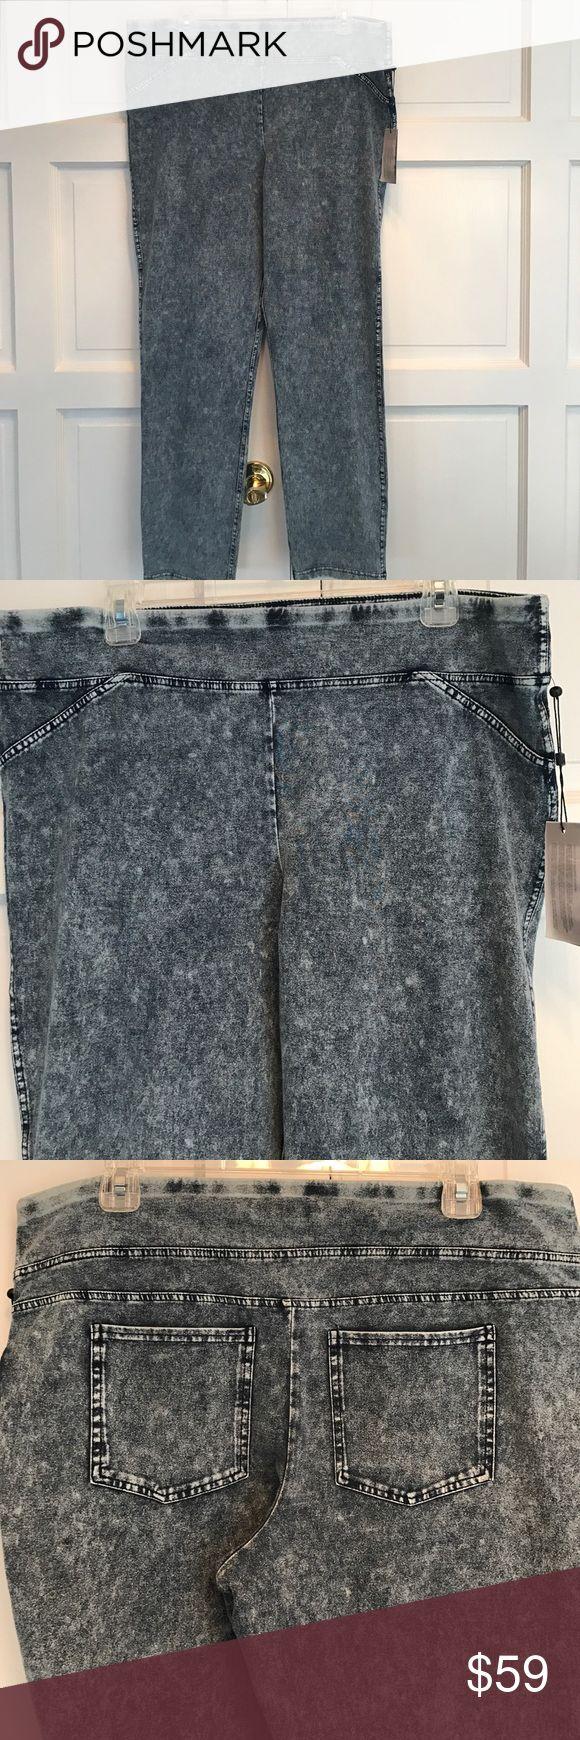 Tommy Hilfiger Denim Stretch Pants. Size XL Never worn. Still has tags. 90% cotton 10% elastic. Very soft. Tommy Hilfiger Pants